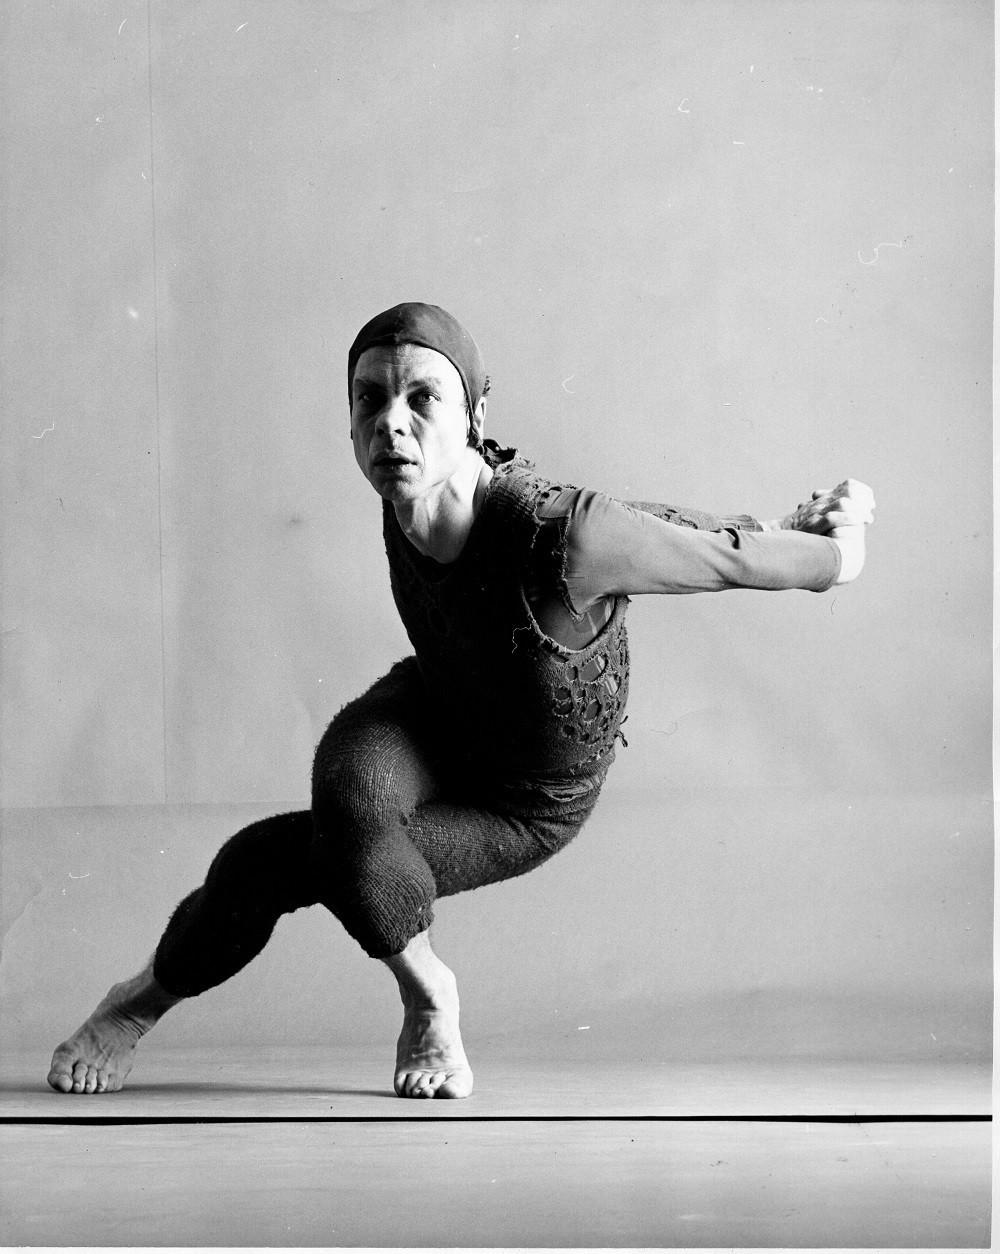 Merce Cunningham in Changeling, 1957 (studio photograph), photo by Richard Rutledge, courtesy the Merce Cunningham Trust